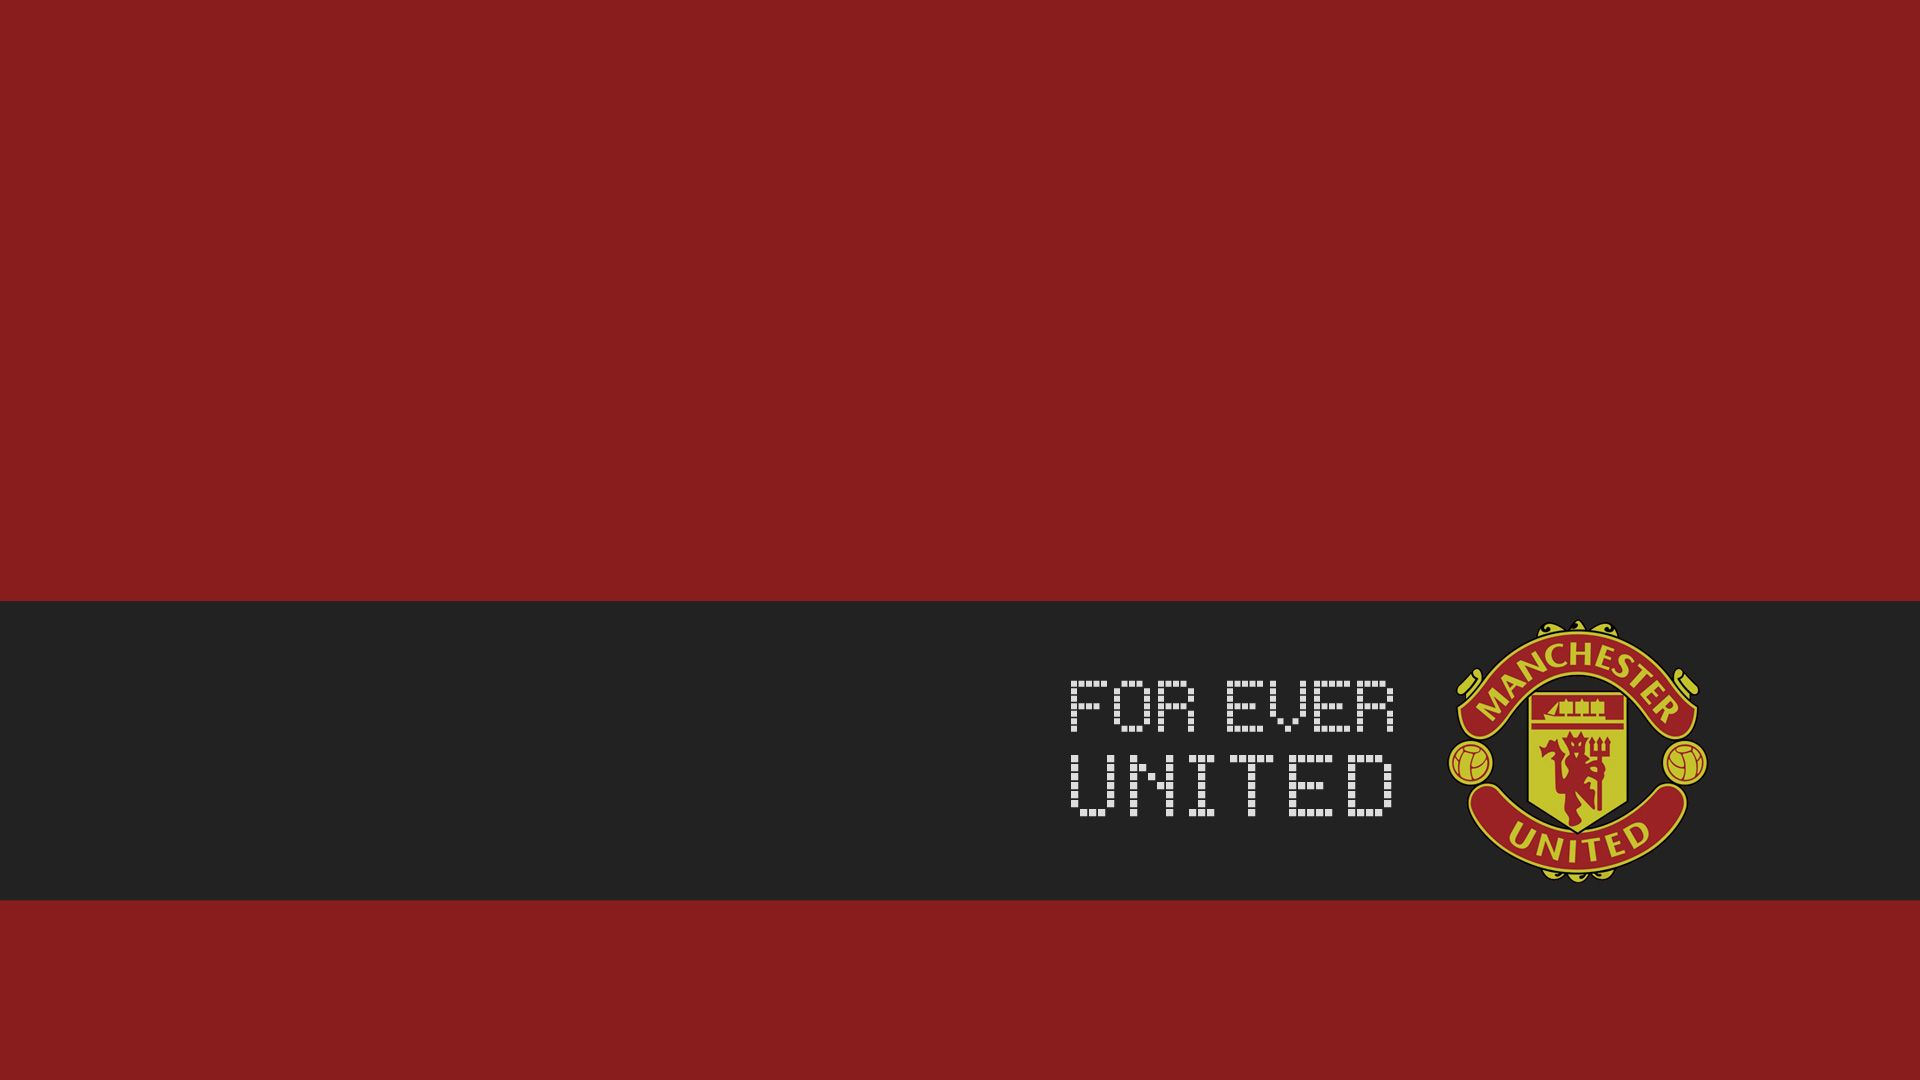 Manchester United 2014 1120 Hd Screensavers Manchester United Wallpaper Manchester United Manchester United Logo